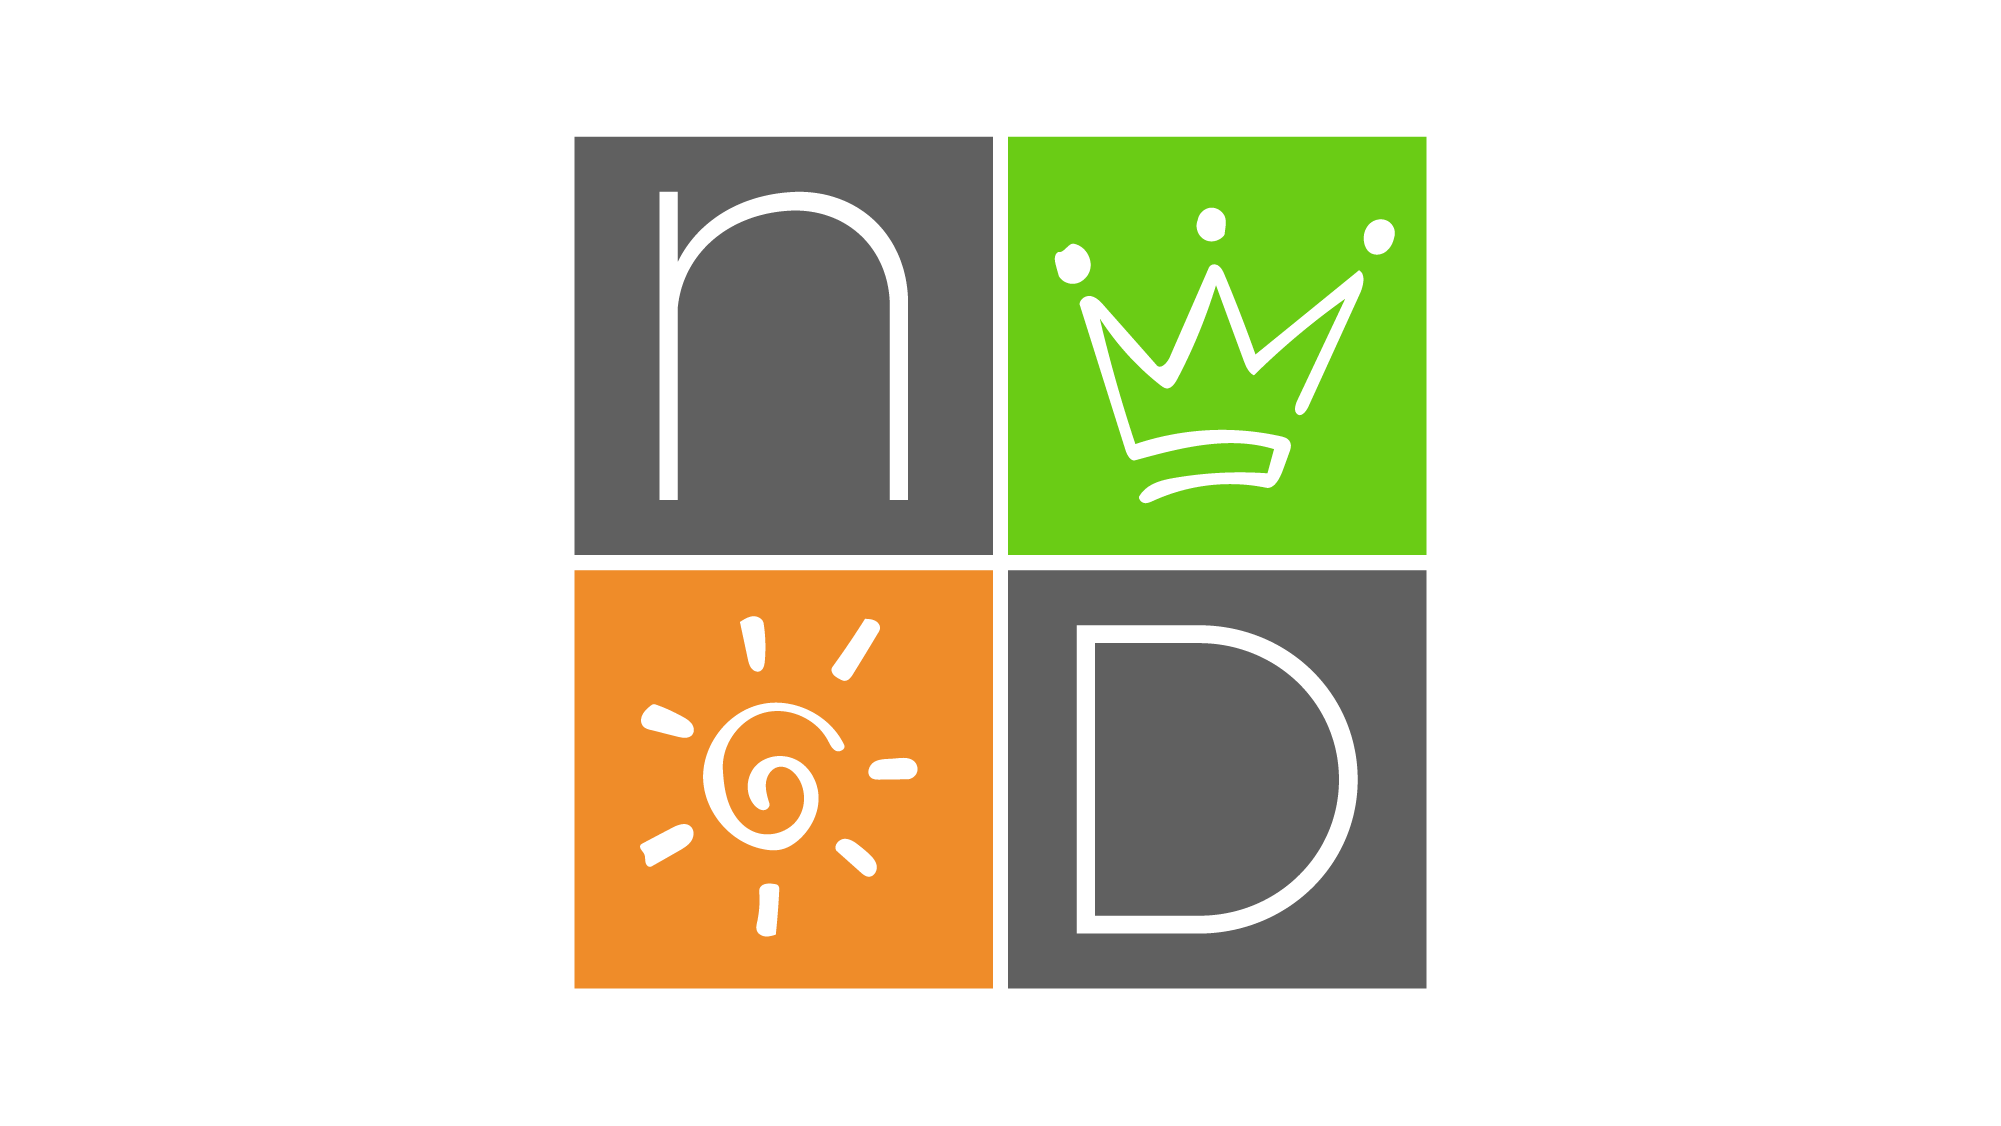 Nana Darkoa Brand ID_icon